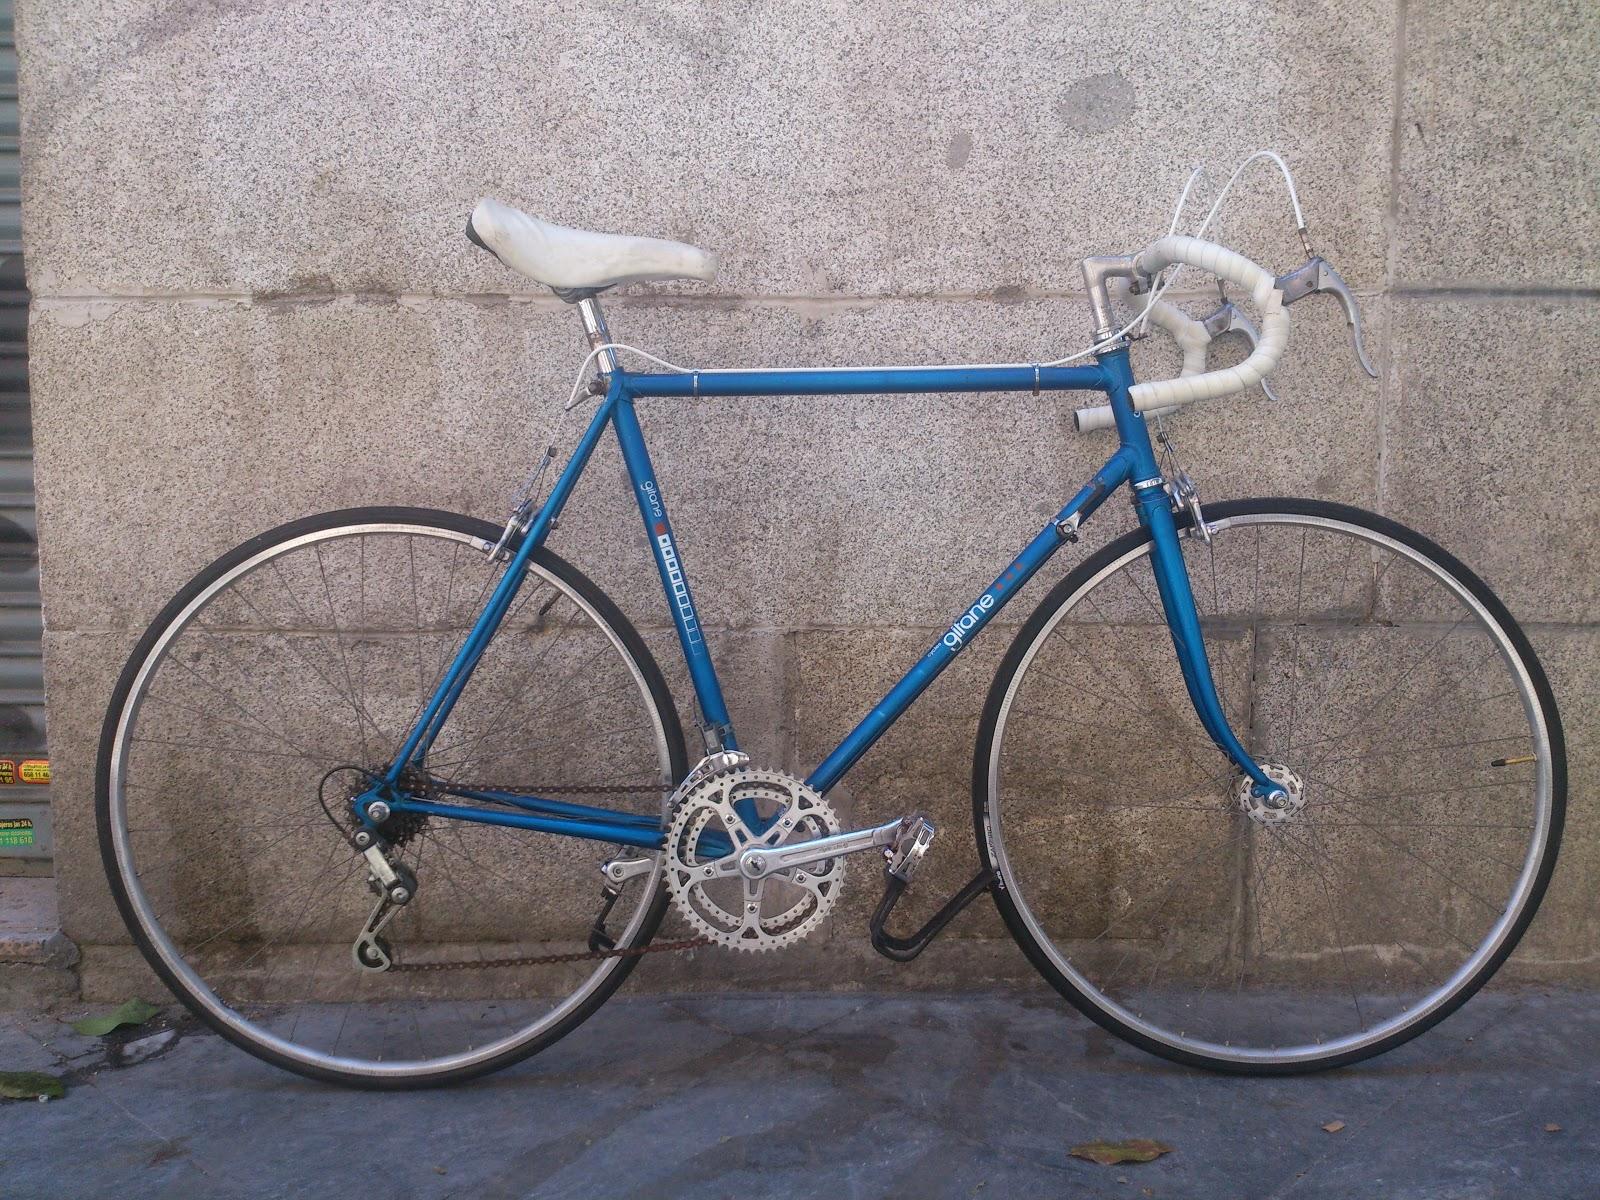 Modernizar Gitane Vitus 788 « Foro de cicloturismo y viajes en bicicleta